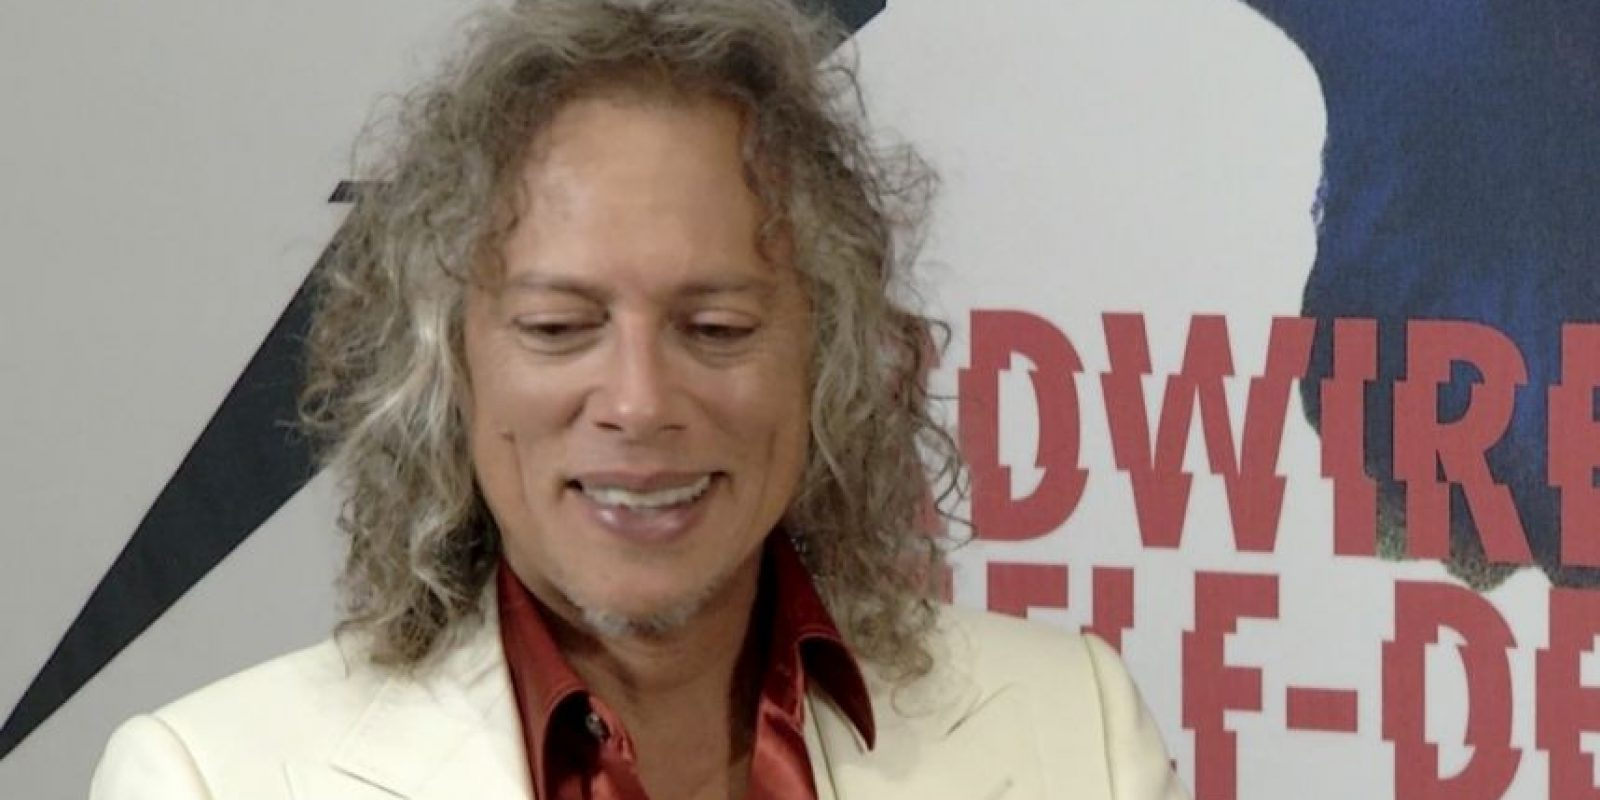 Universal Music Foto:Kirk Hammett, guitarrista de Metallica